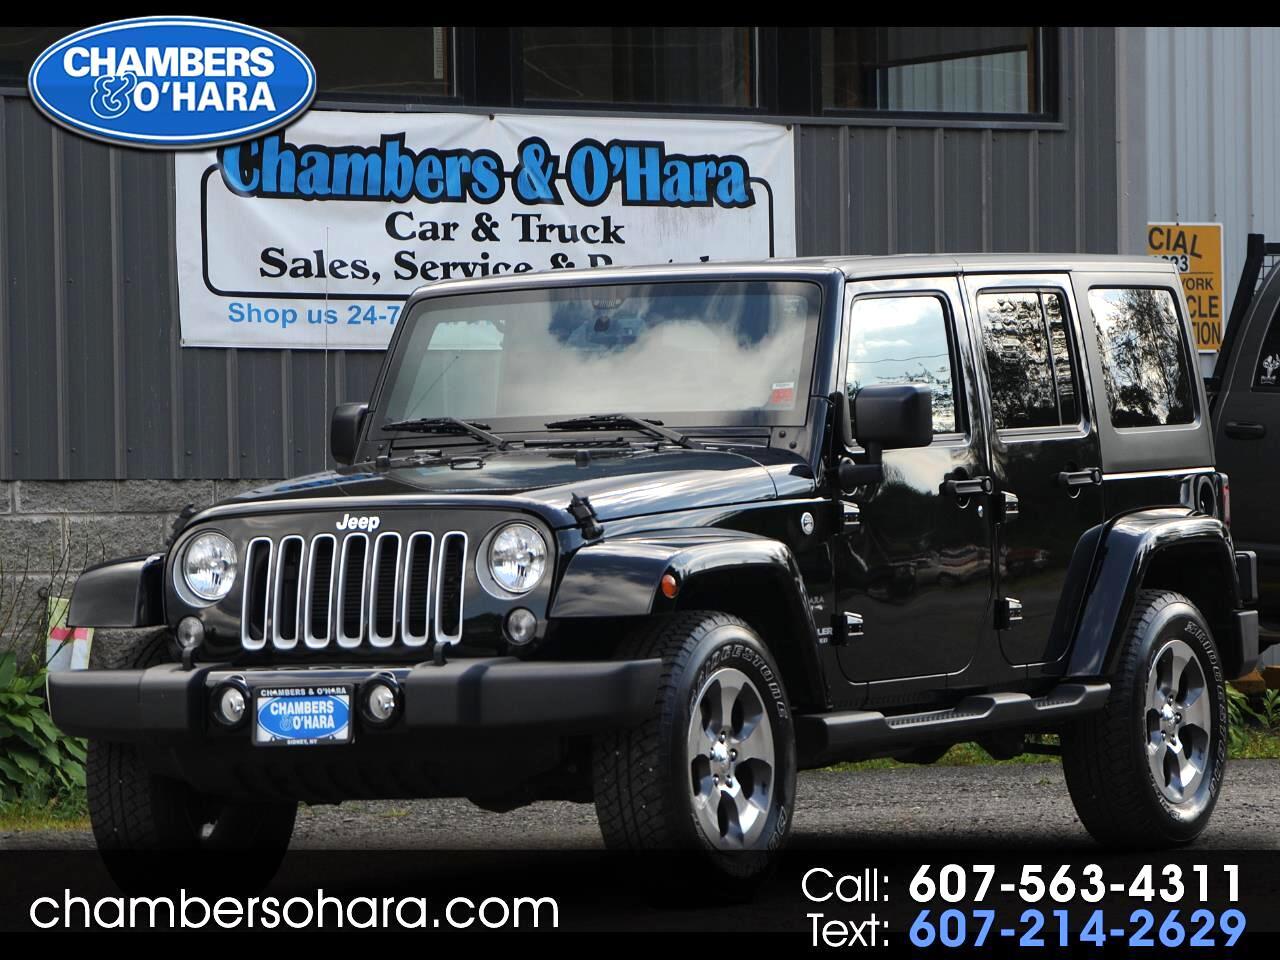 2017 Jeep Wrangler Unlimited Sahara 4WD